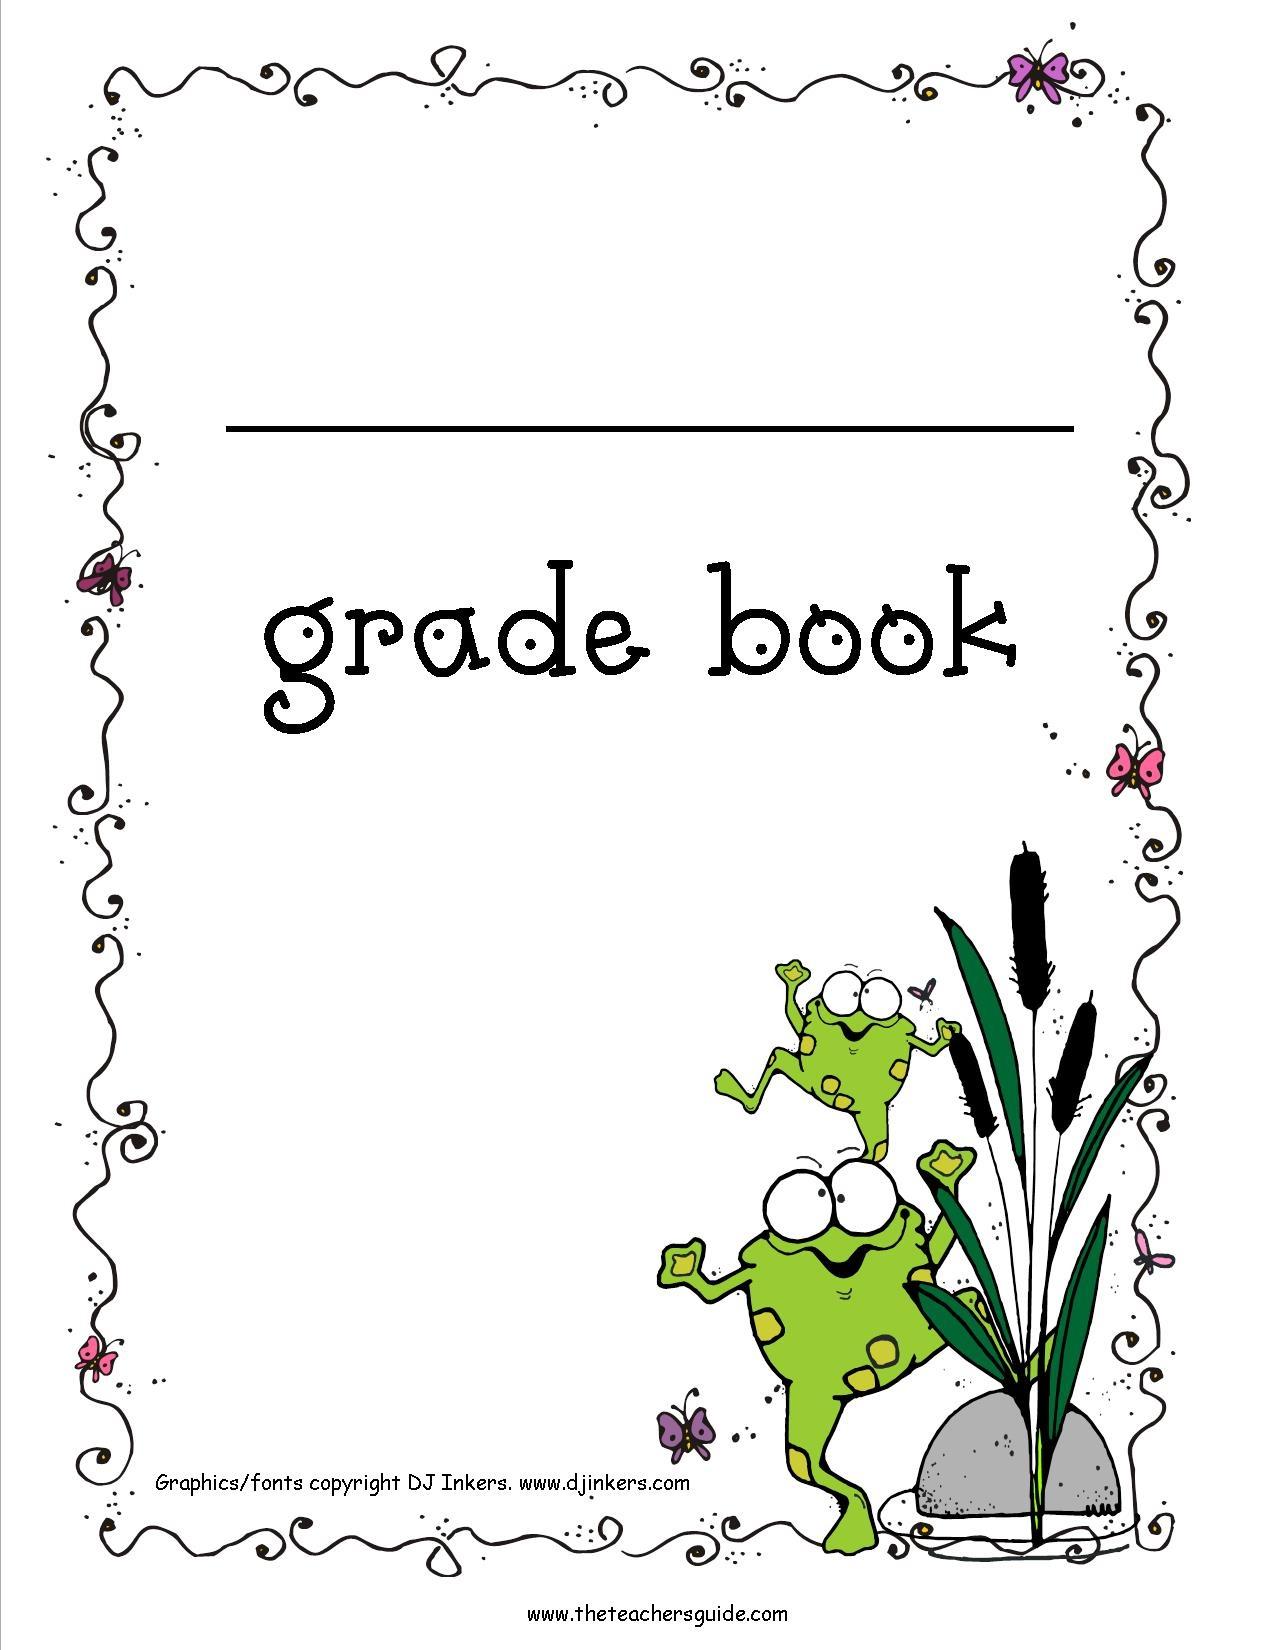 Free Printable Grade Books - Free Printable Grade Sheet